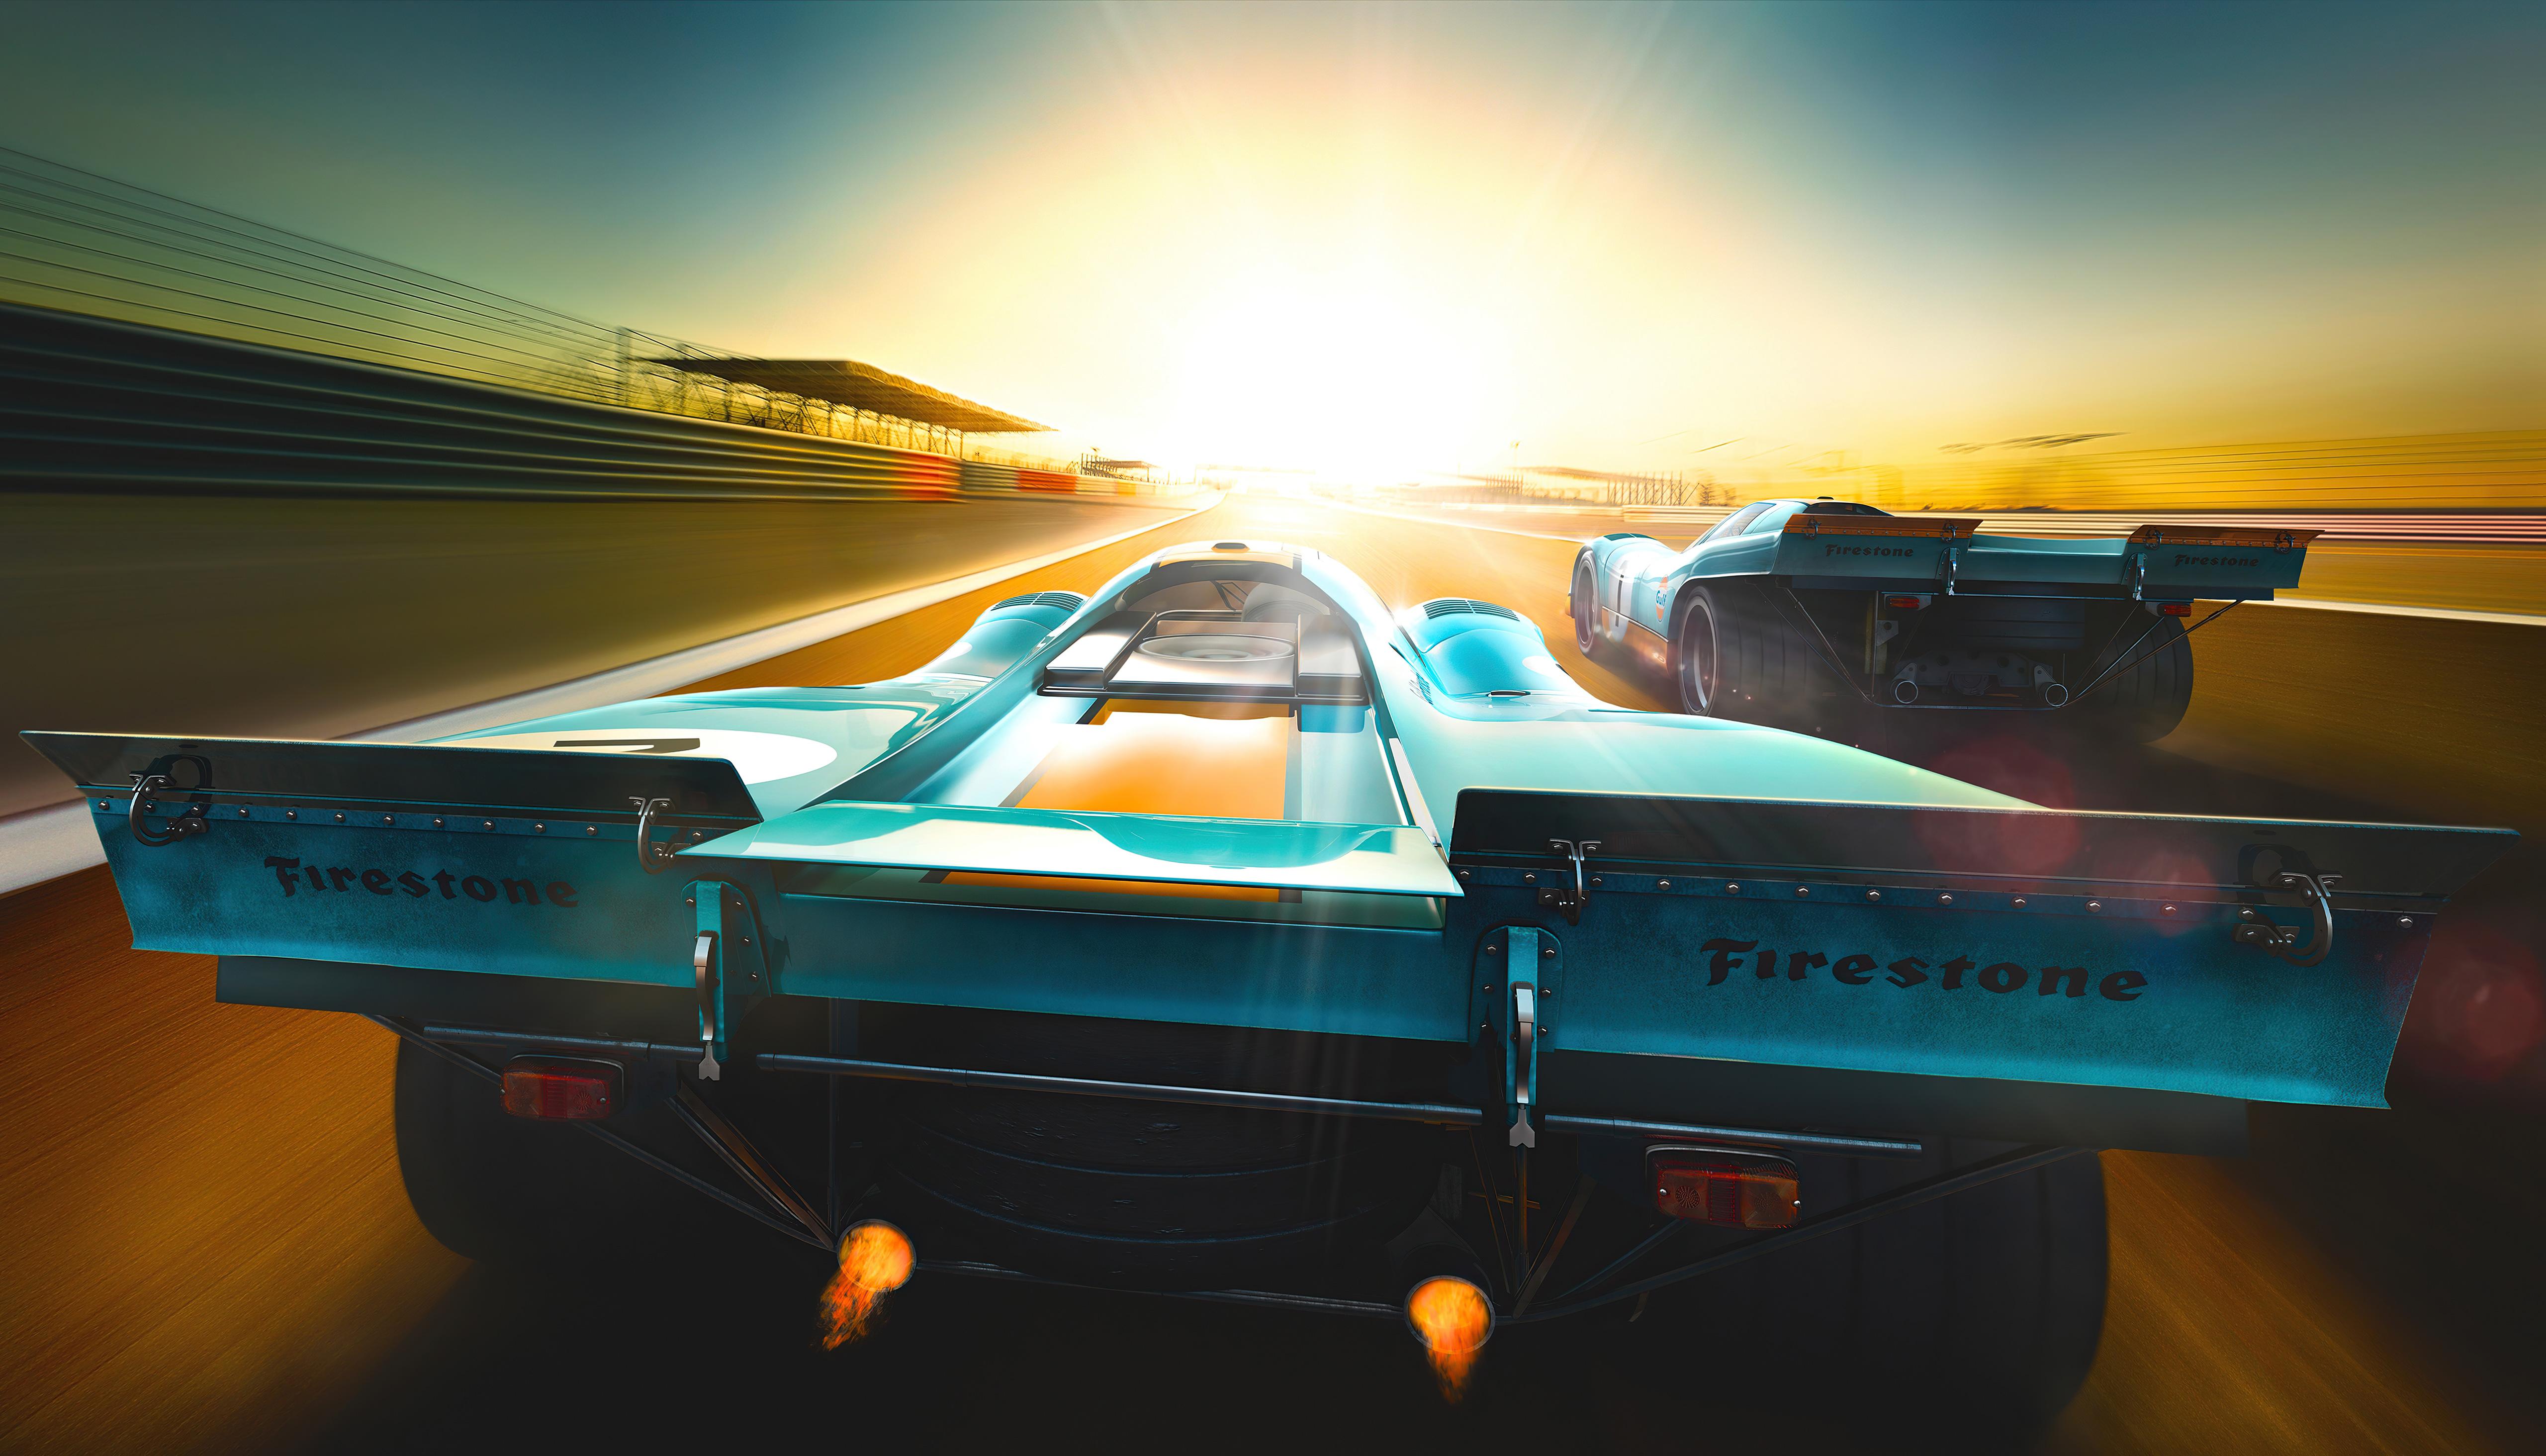 daytona racing cars 4k 1620170158 - Daytona Racing Cars 4k - Daytona Racing Cars 4k wallpapers